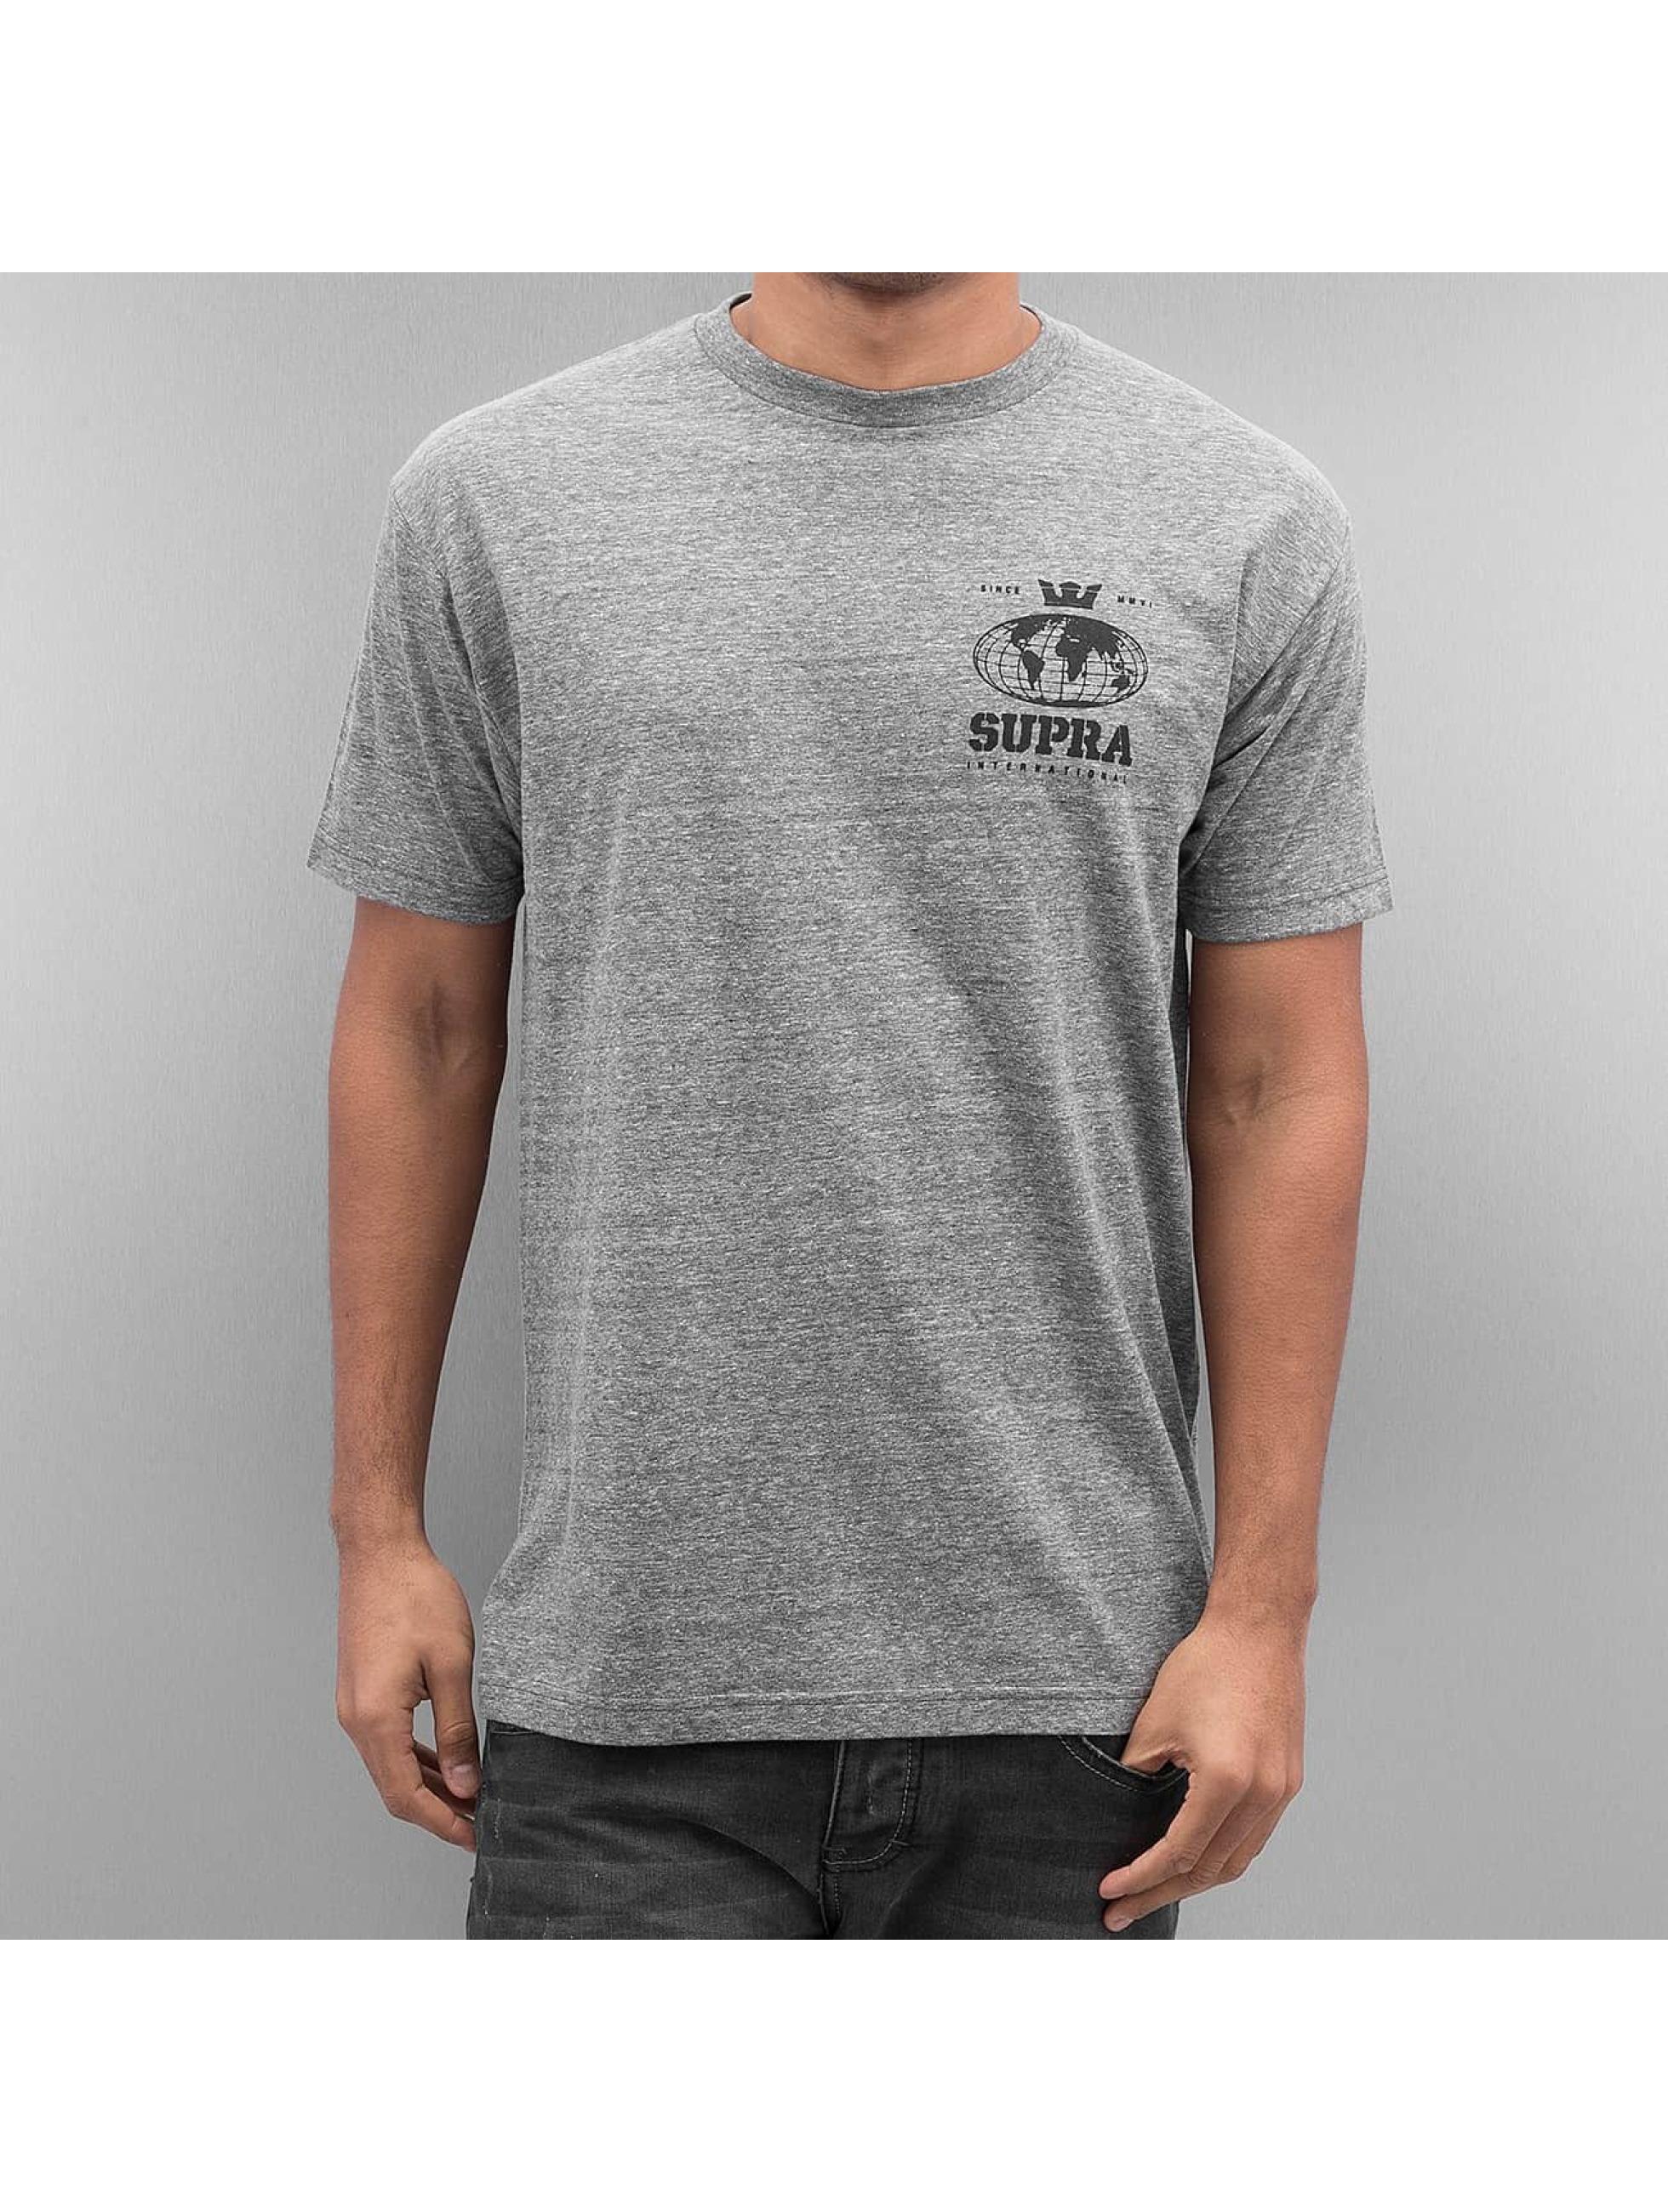 Supra T-shirts Worldwide Reg grå